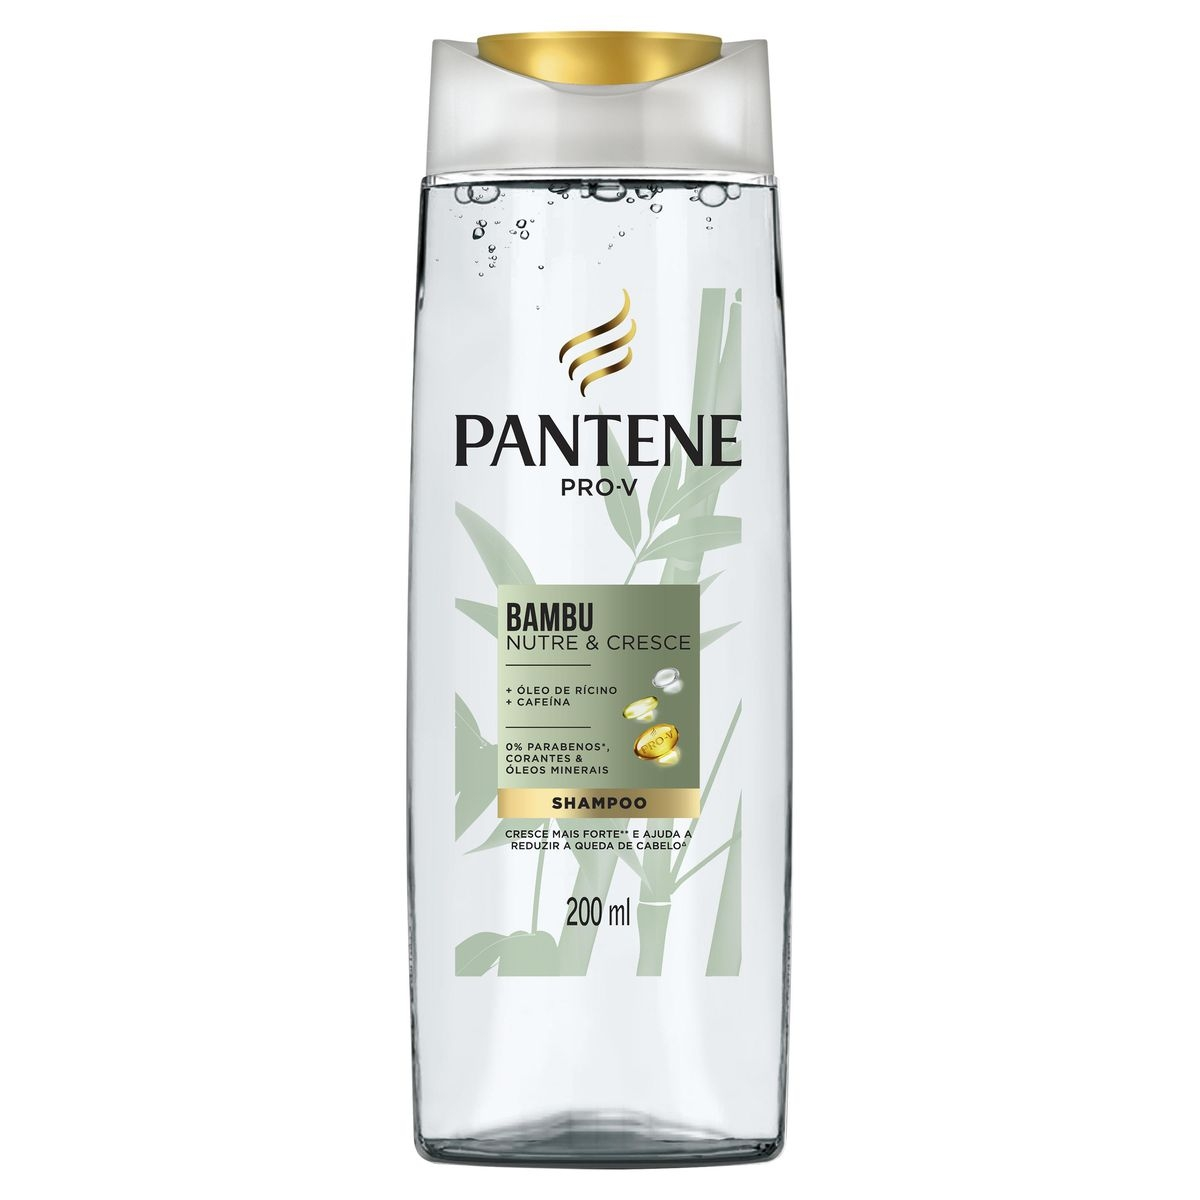 Shampoo Pantene Pro-V Bambu com 200ml 200ml